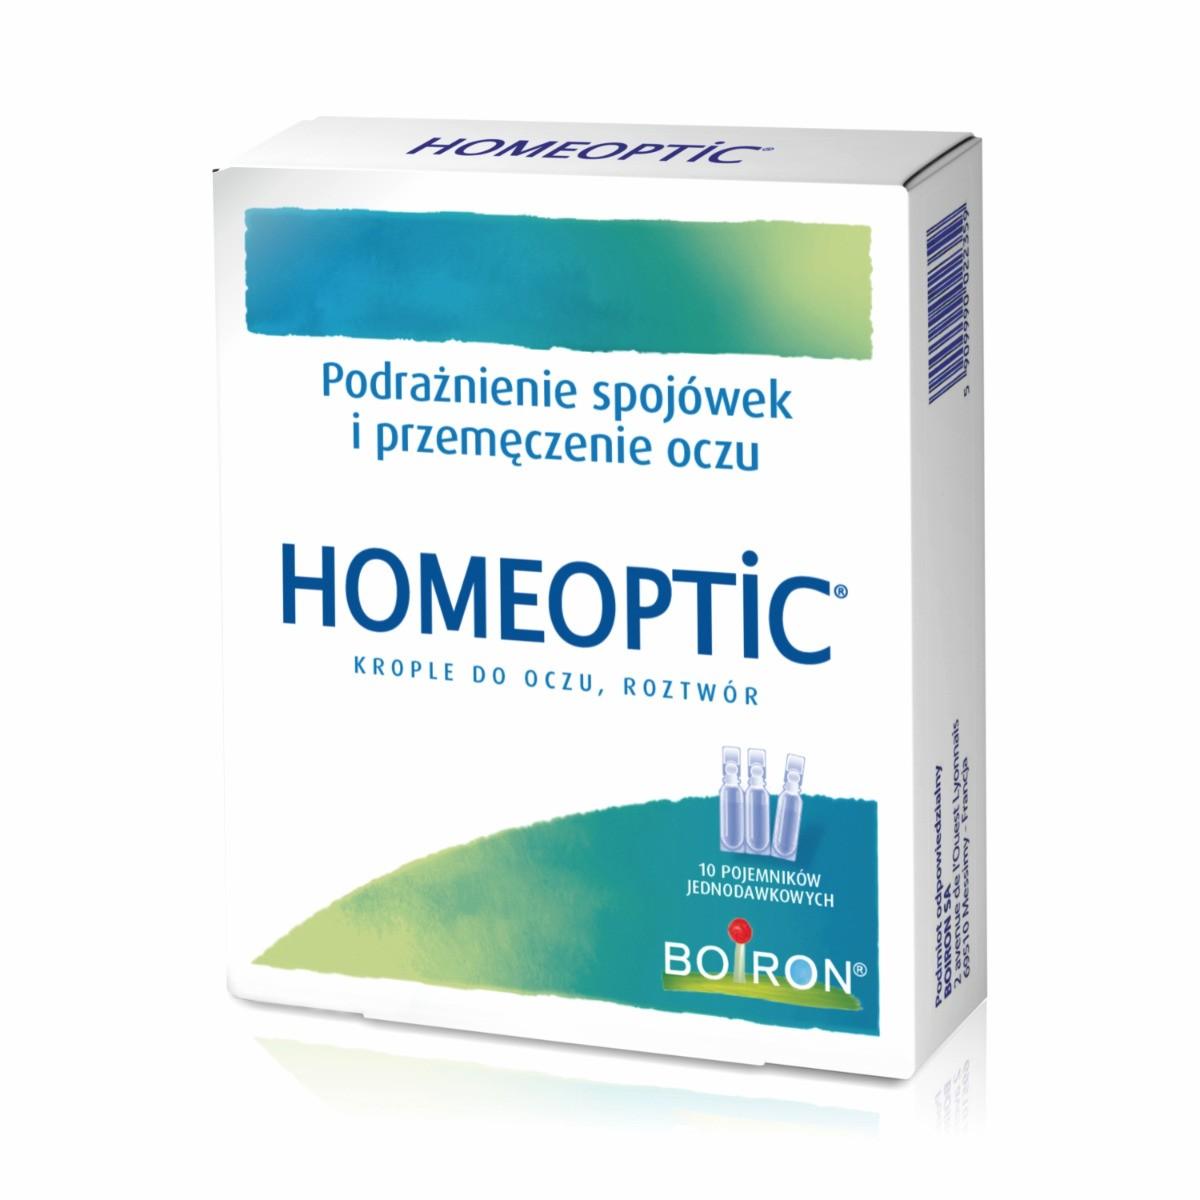 Homeoptic Krople do oczu 10x0,4 ml